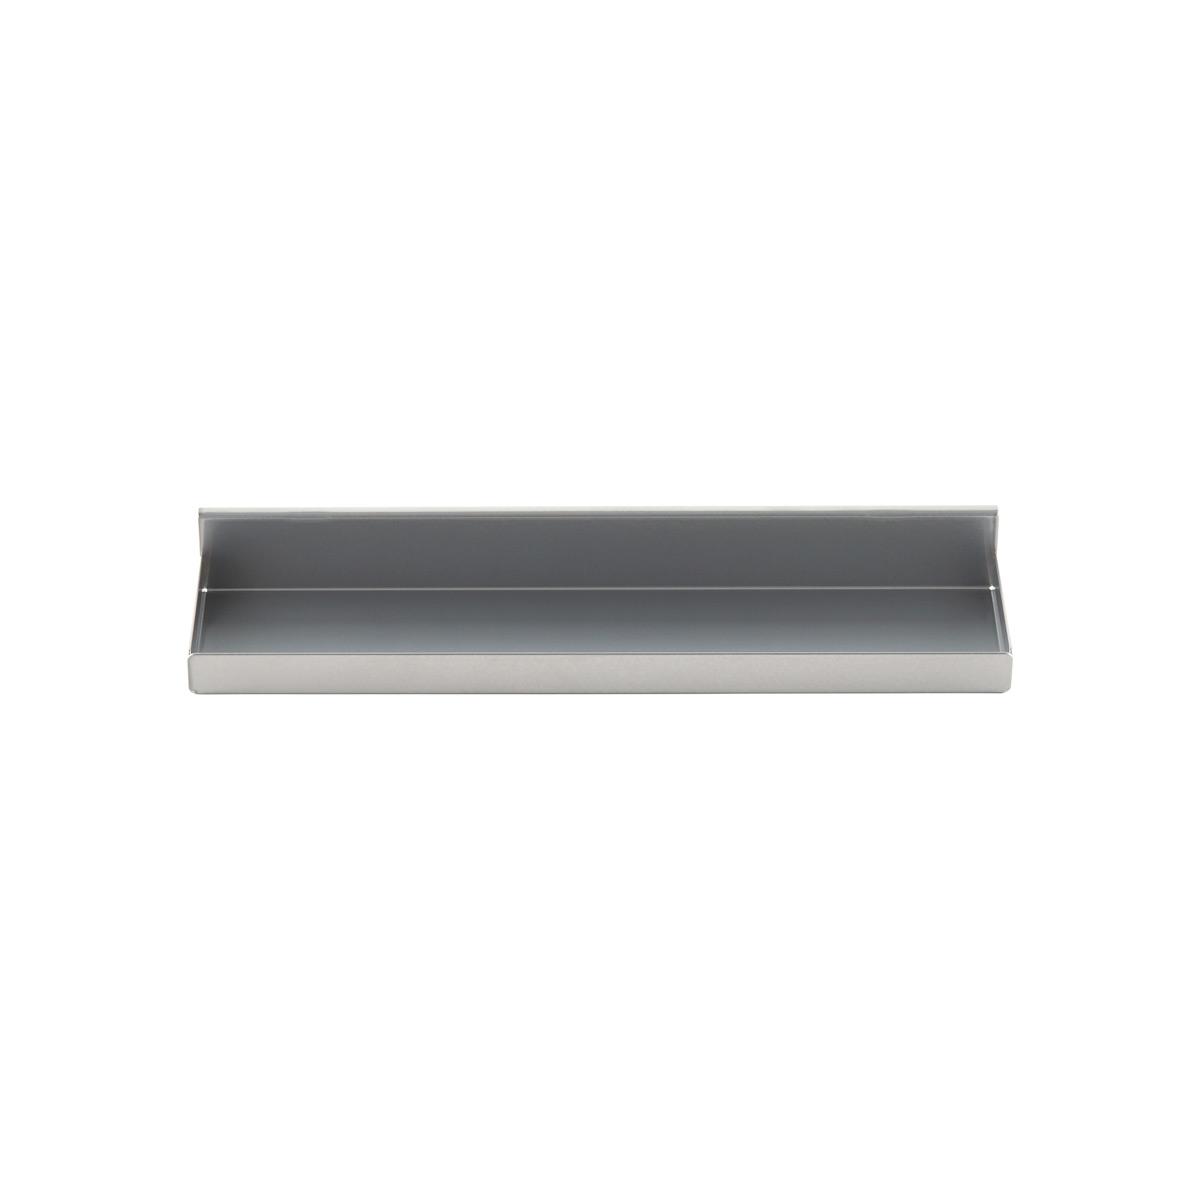 platinum elfa ventilated wire shelf bracket trays